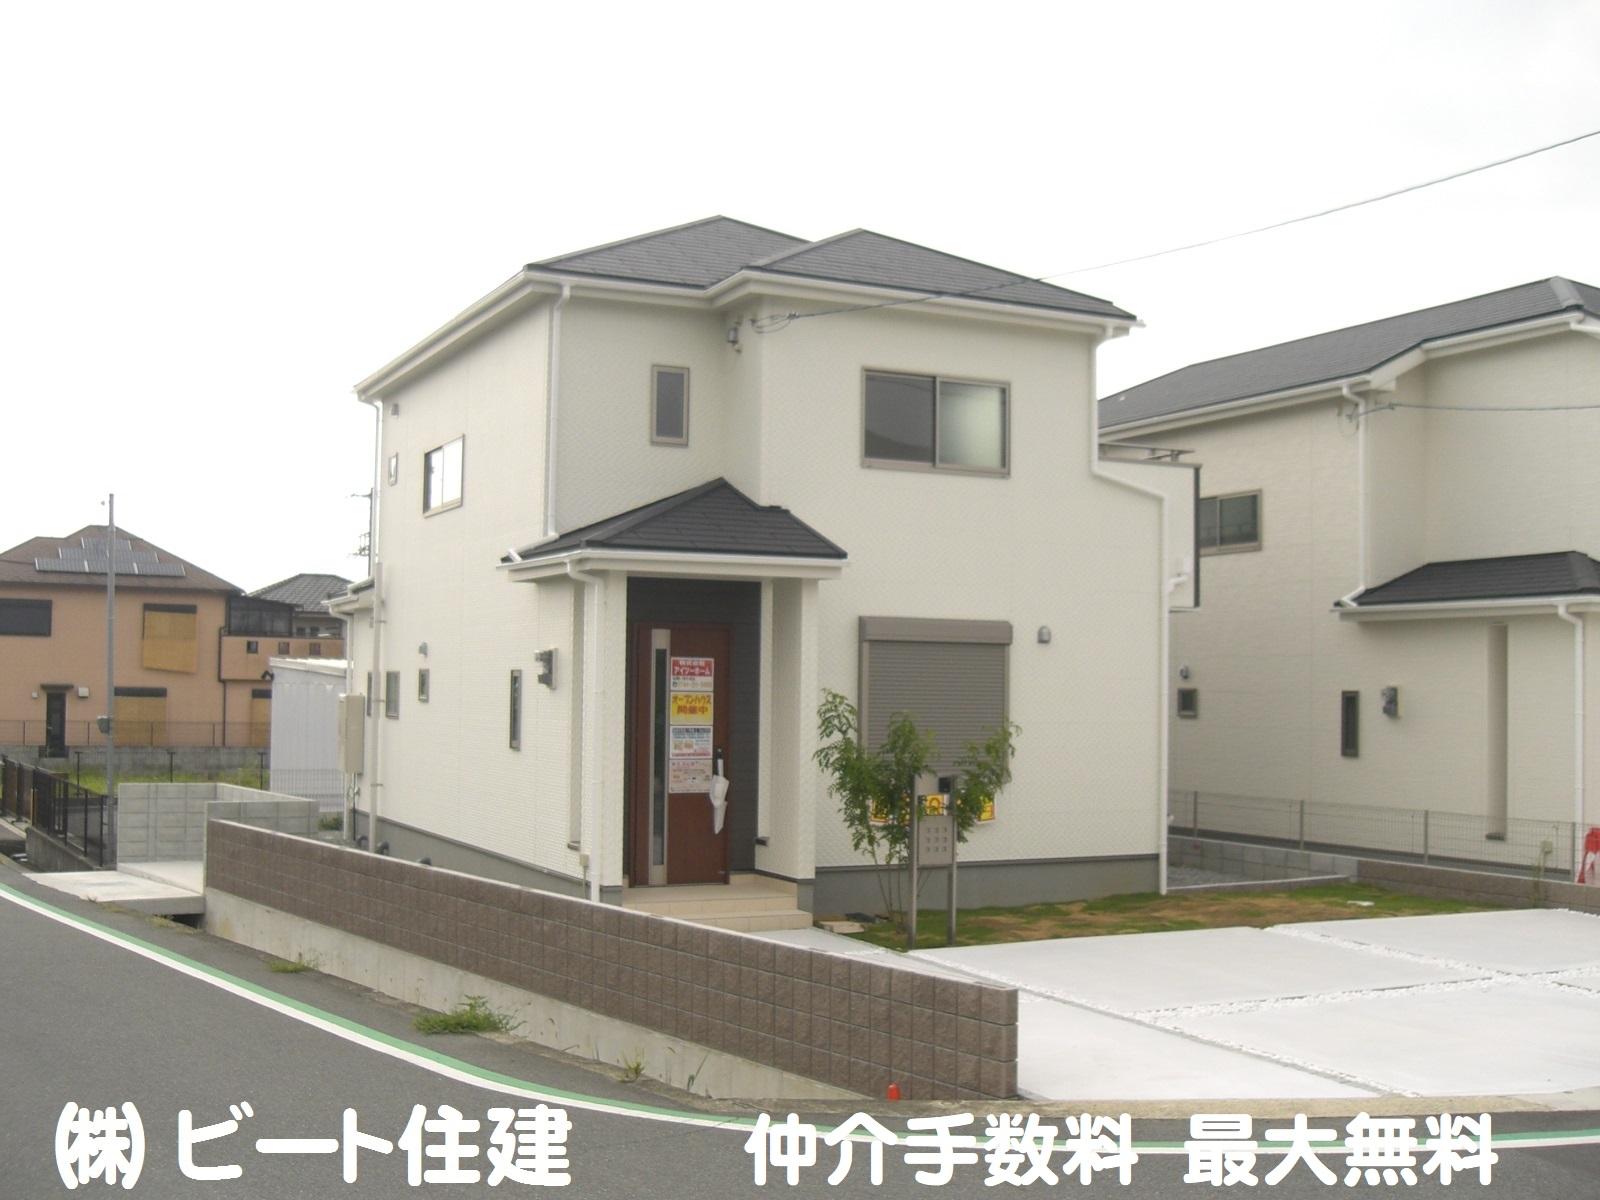 奈良県 新築 葛城市 新築-戸建て お買い得 仲介手数料 最大無料 大幅値引き ビート住建